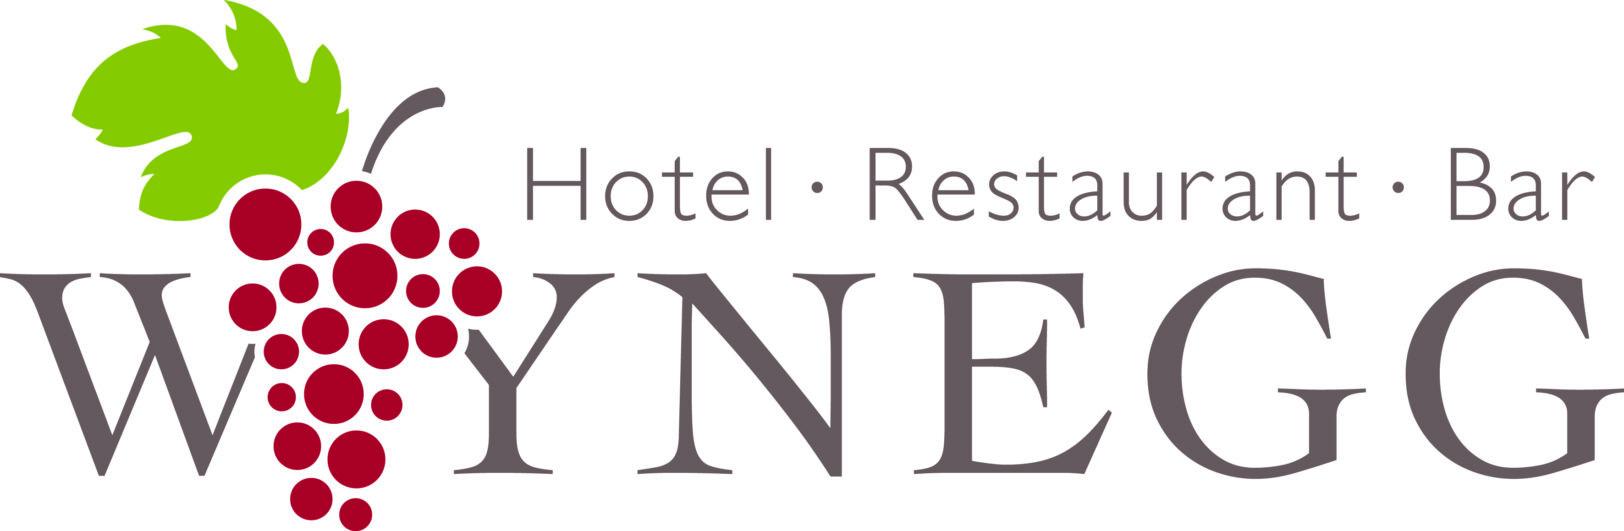 Wynegg Logo